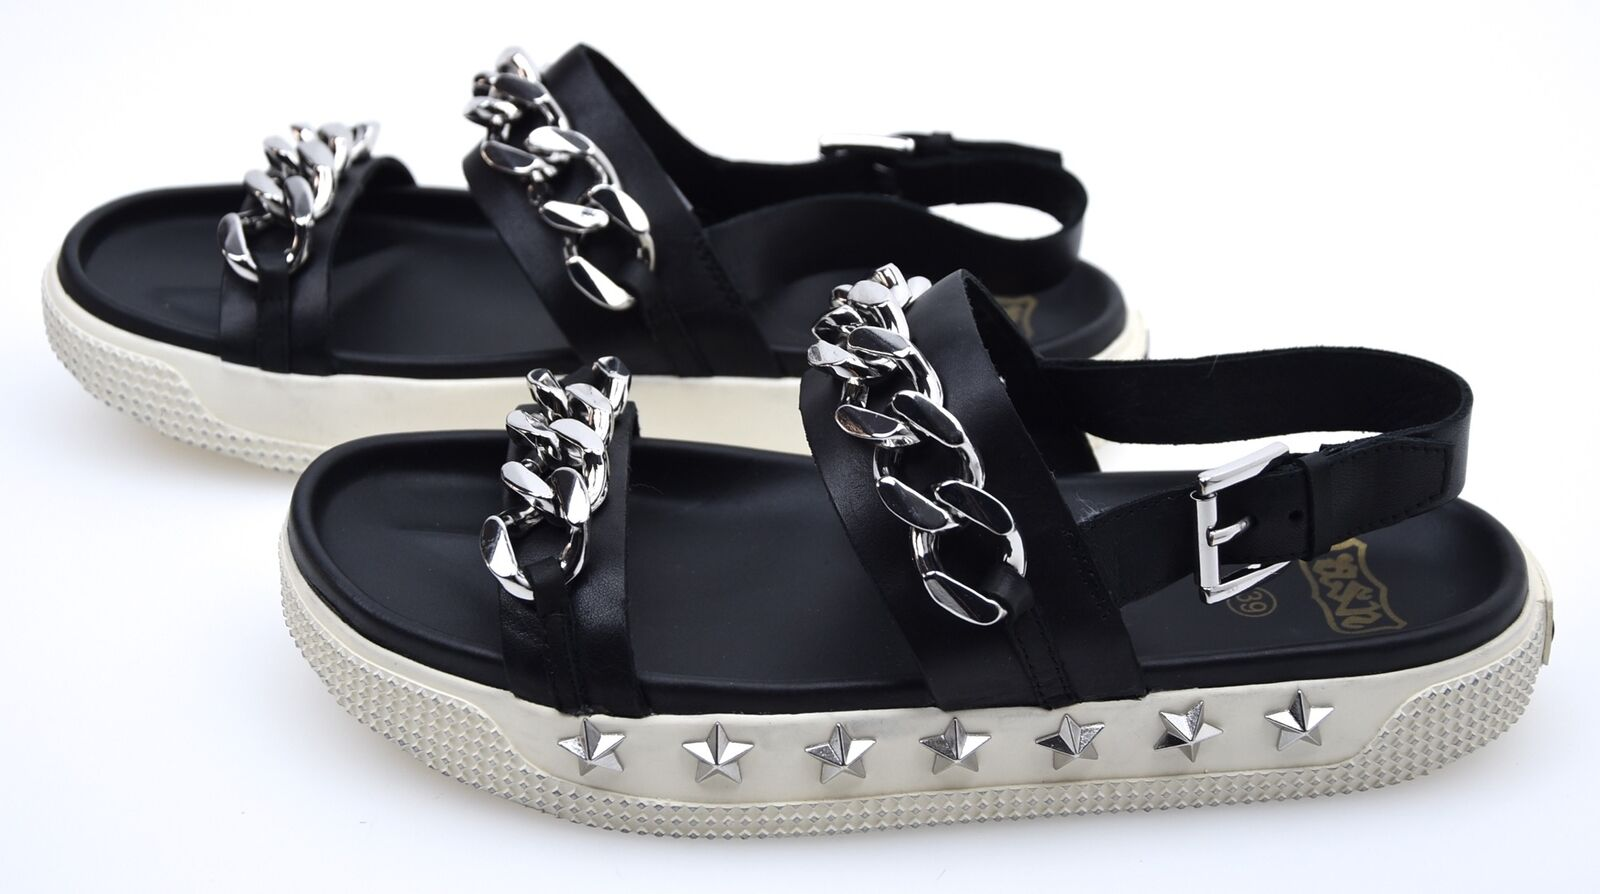 Ash kvinnor skor Leisure Casual Sandal läder Art Kristen ssp15 -sl108663 -001